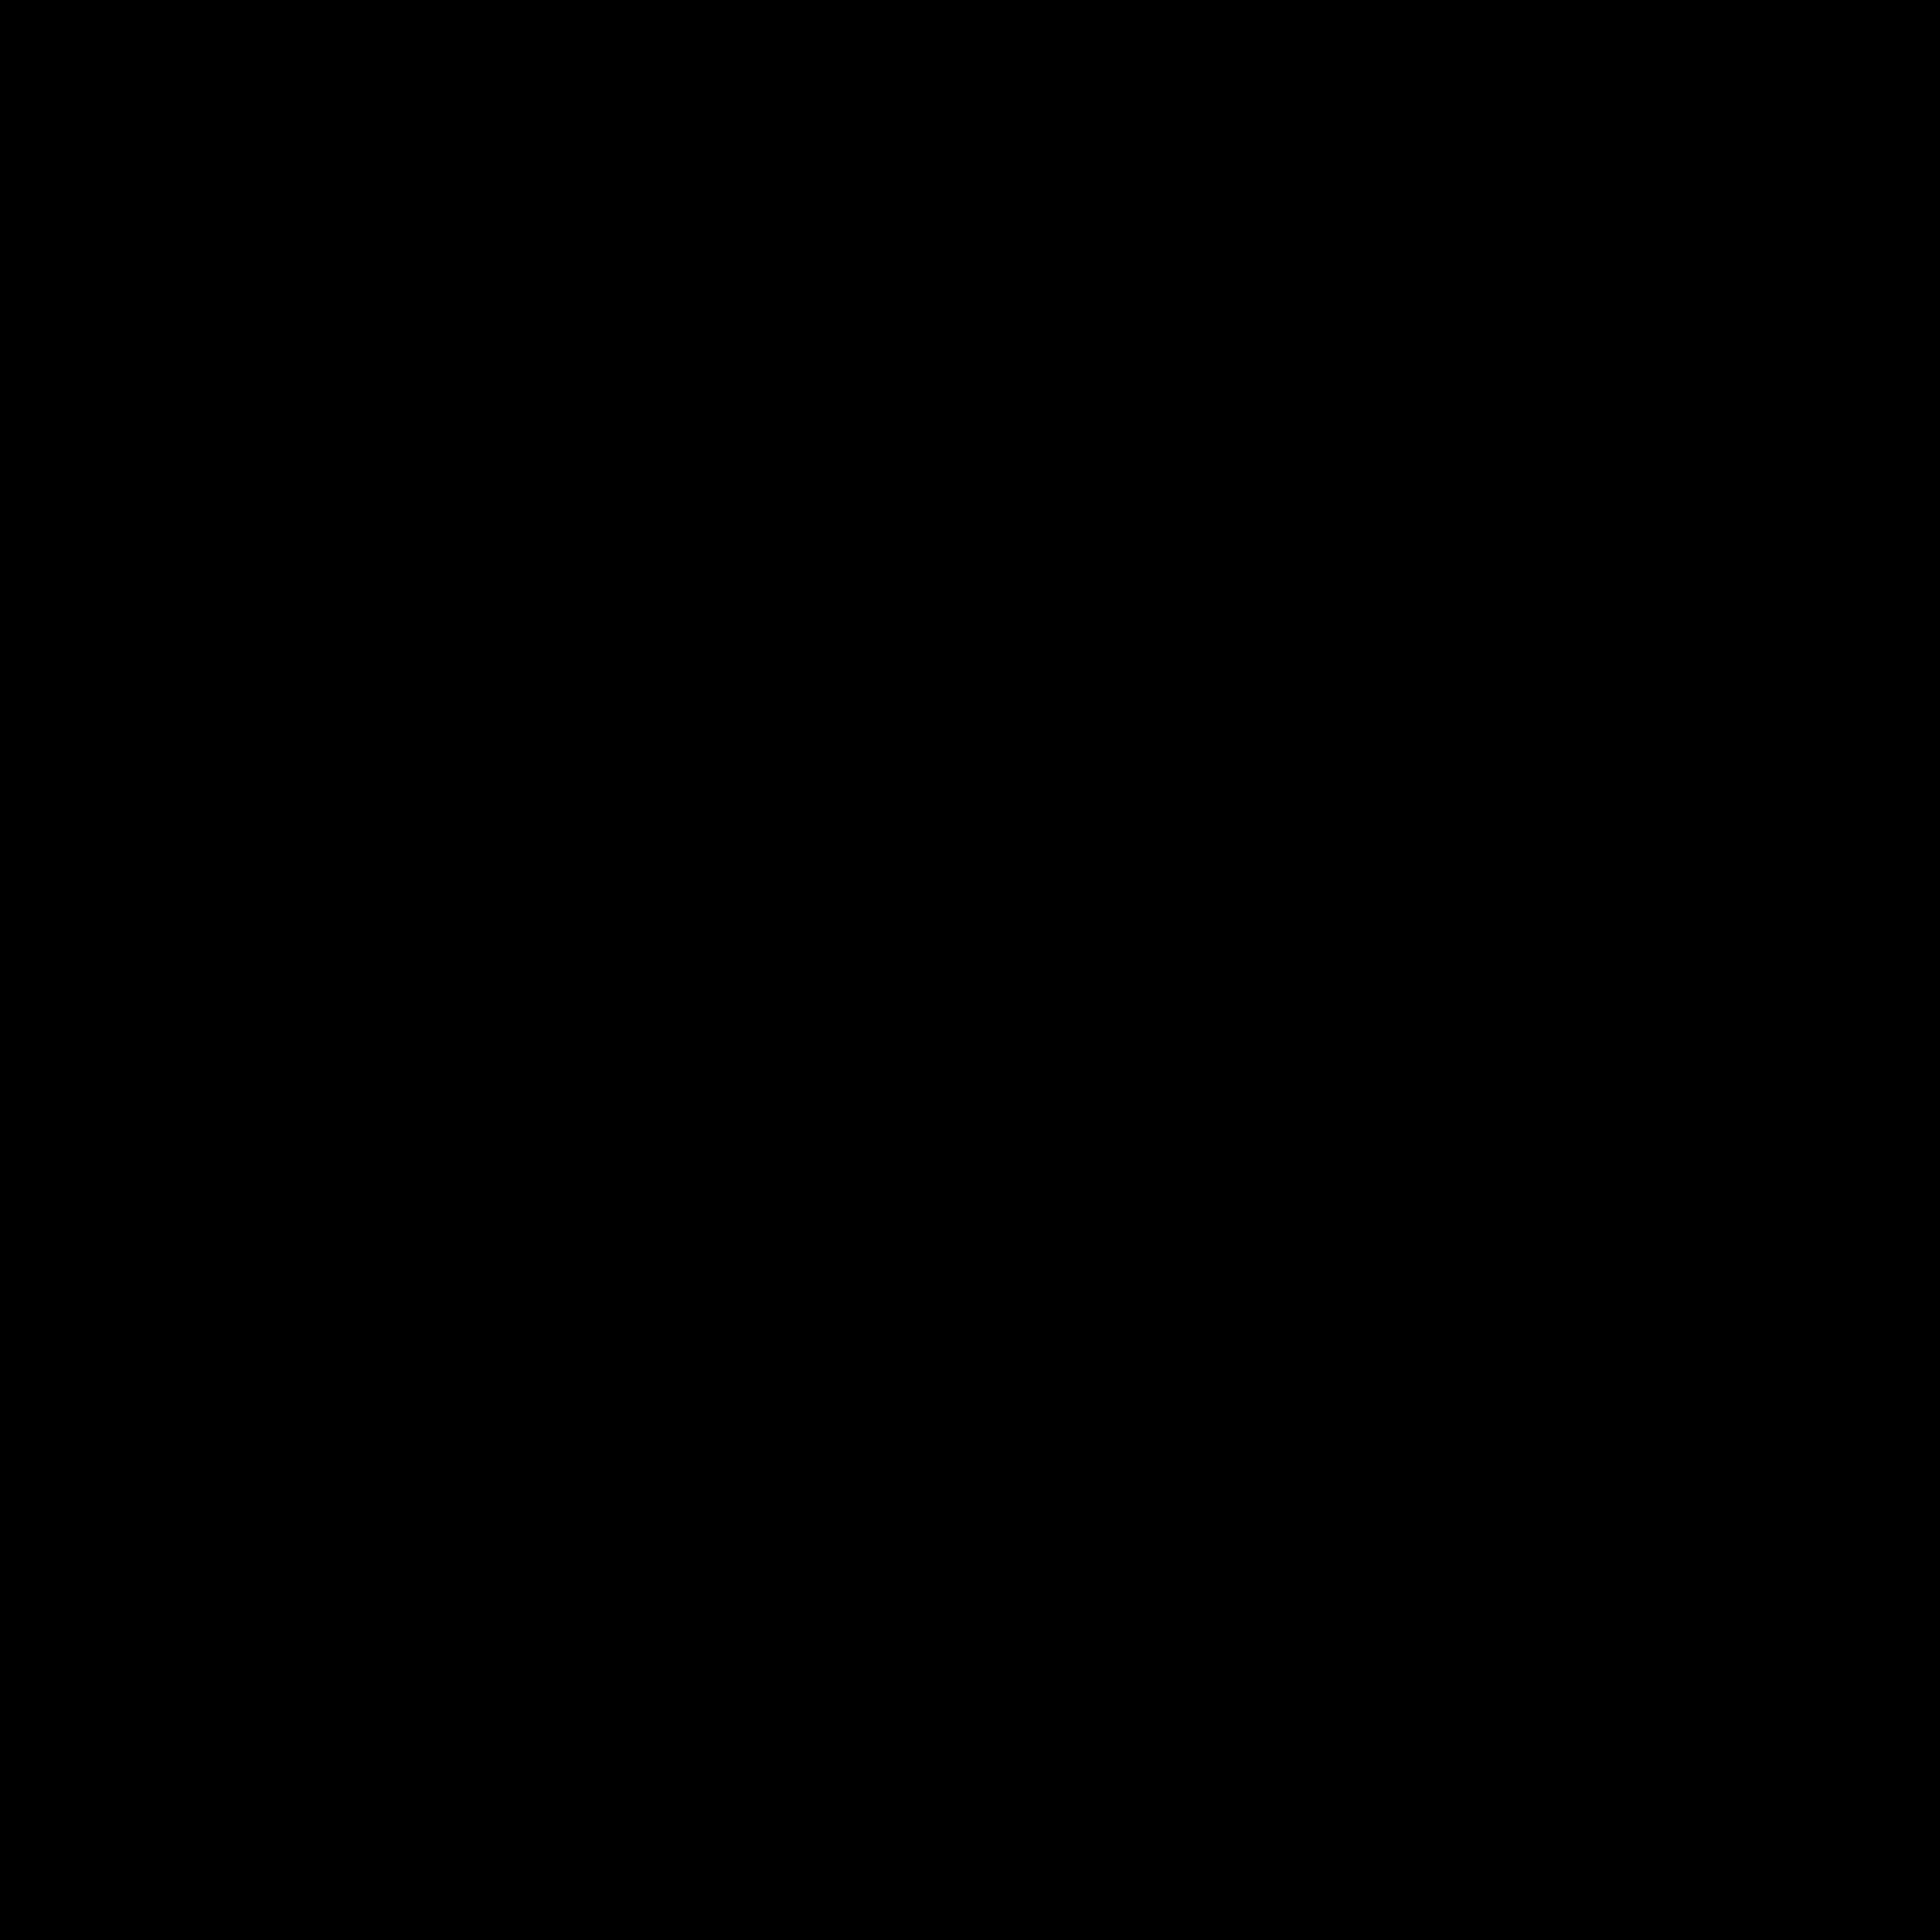 Plug clipart current electricity. Attractive ac voltage symbol